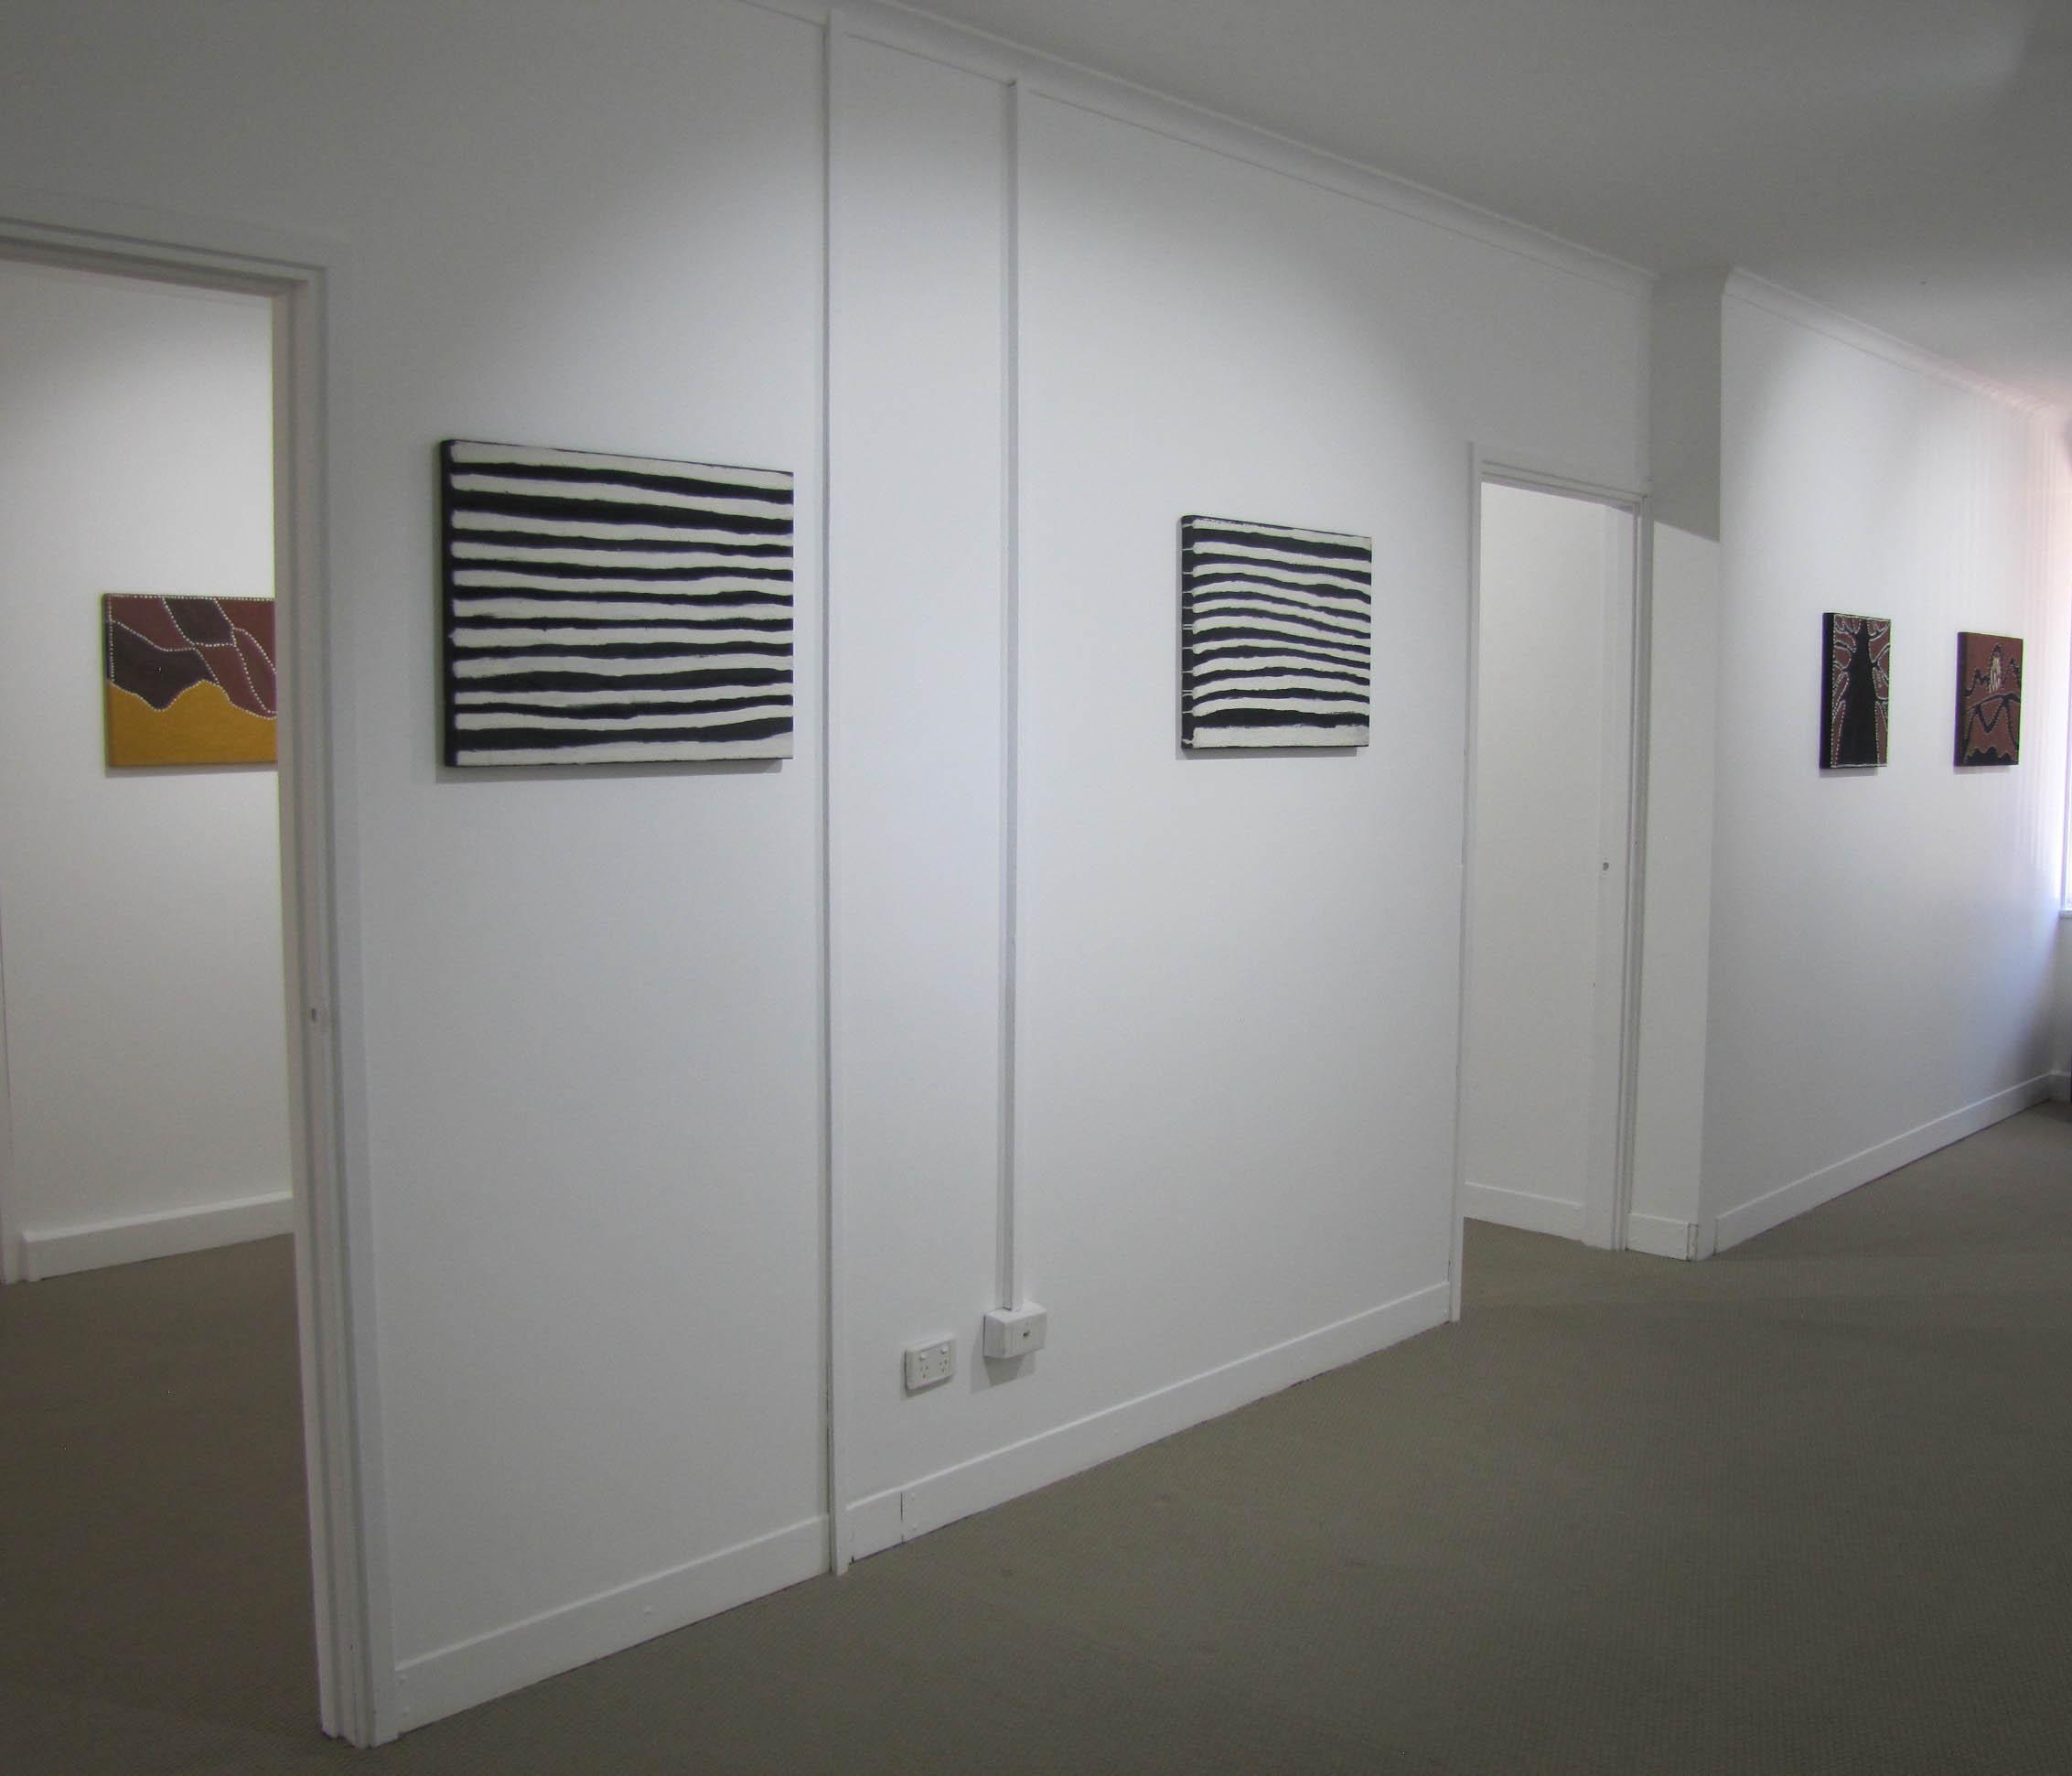 NSG. Warmun 4 exhibition. Exhibition views 6.jpg